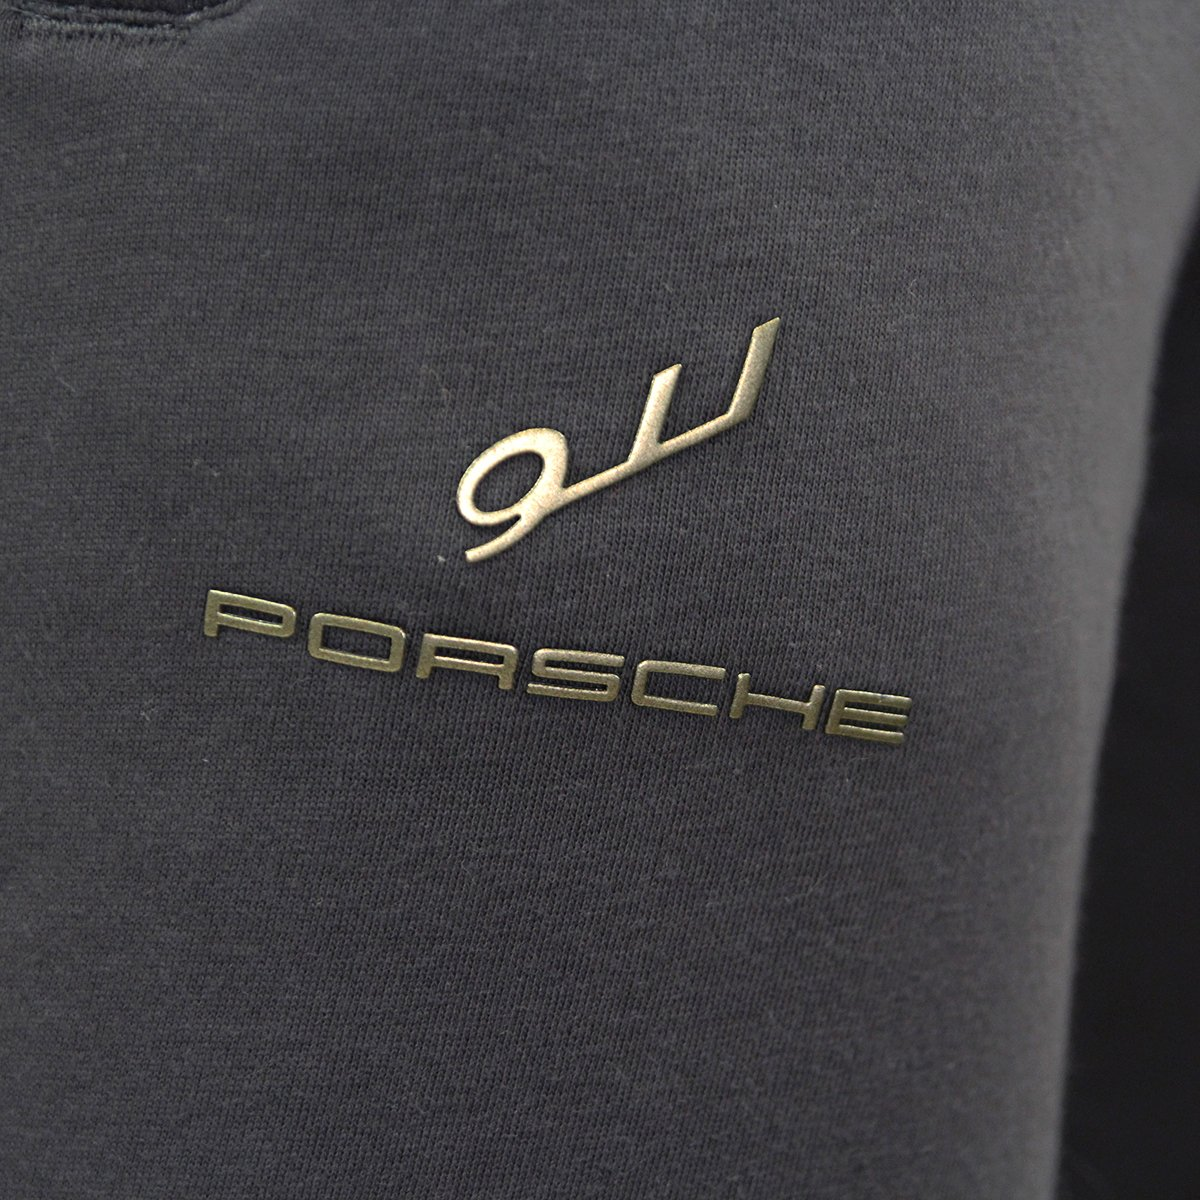 Adidas Pantalon Track Porsche Pants Homme 911 deBrWCxo